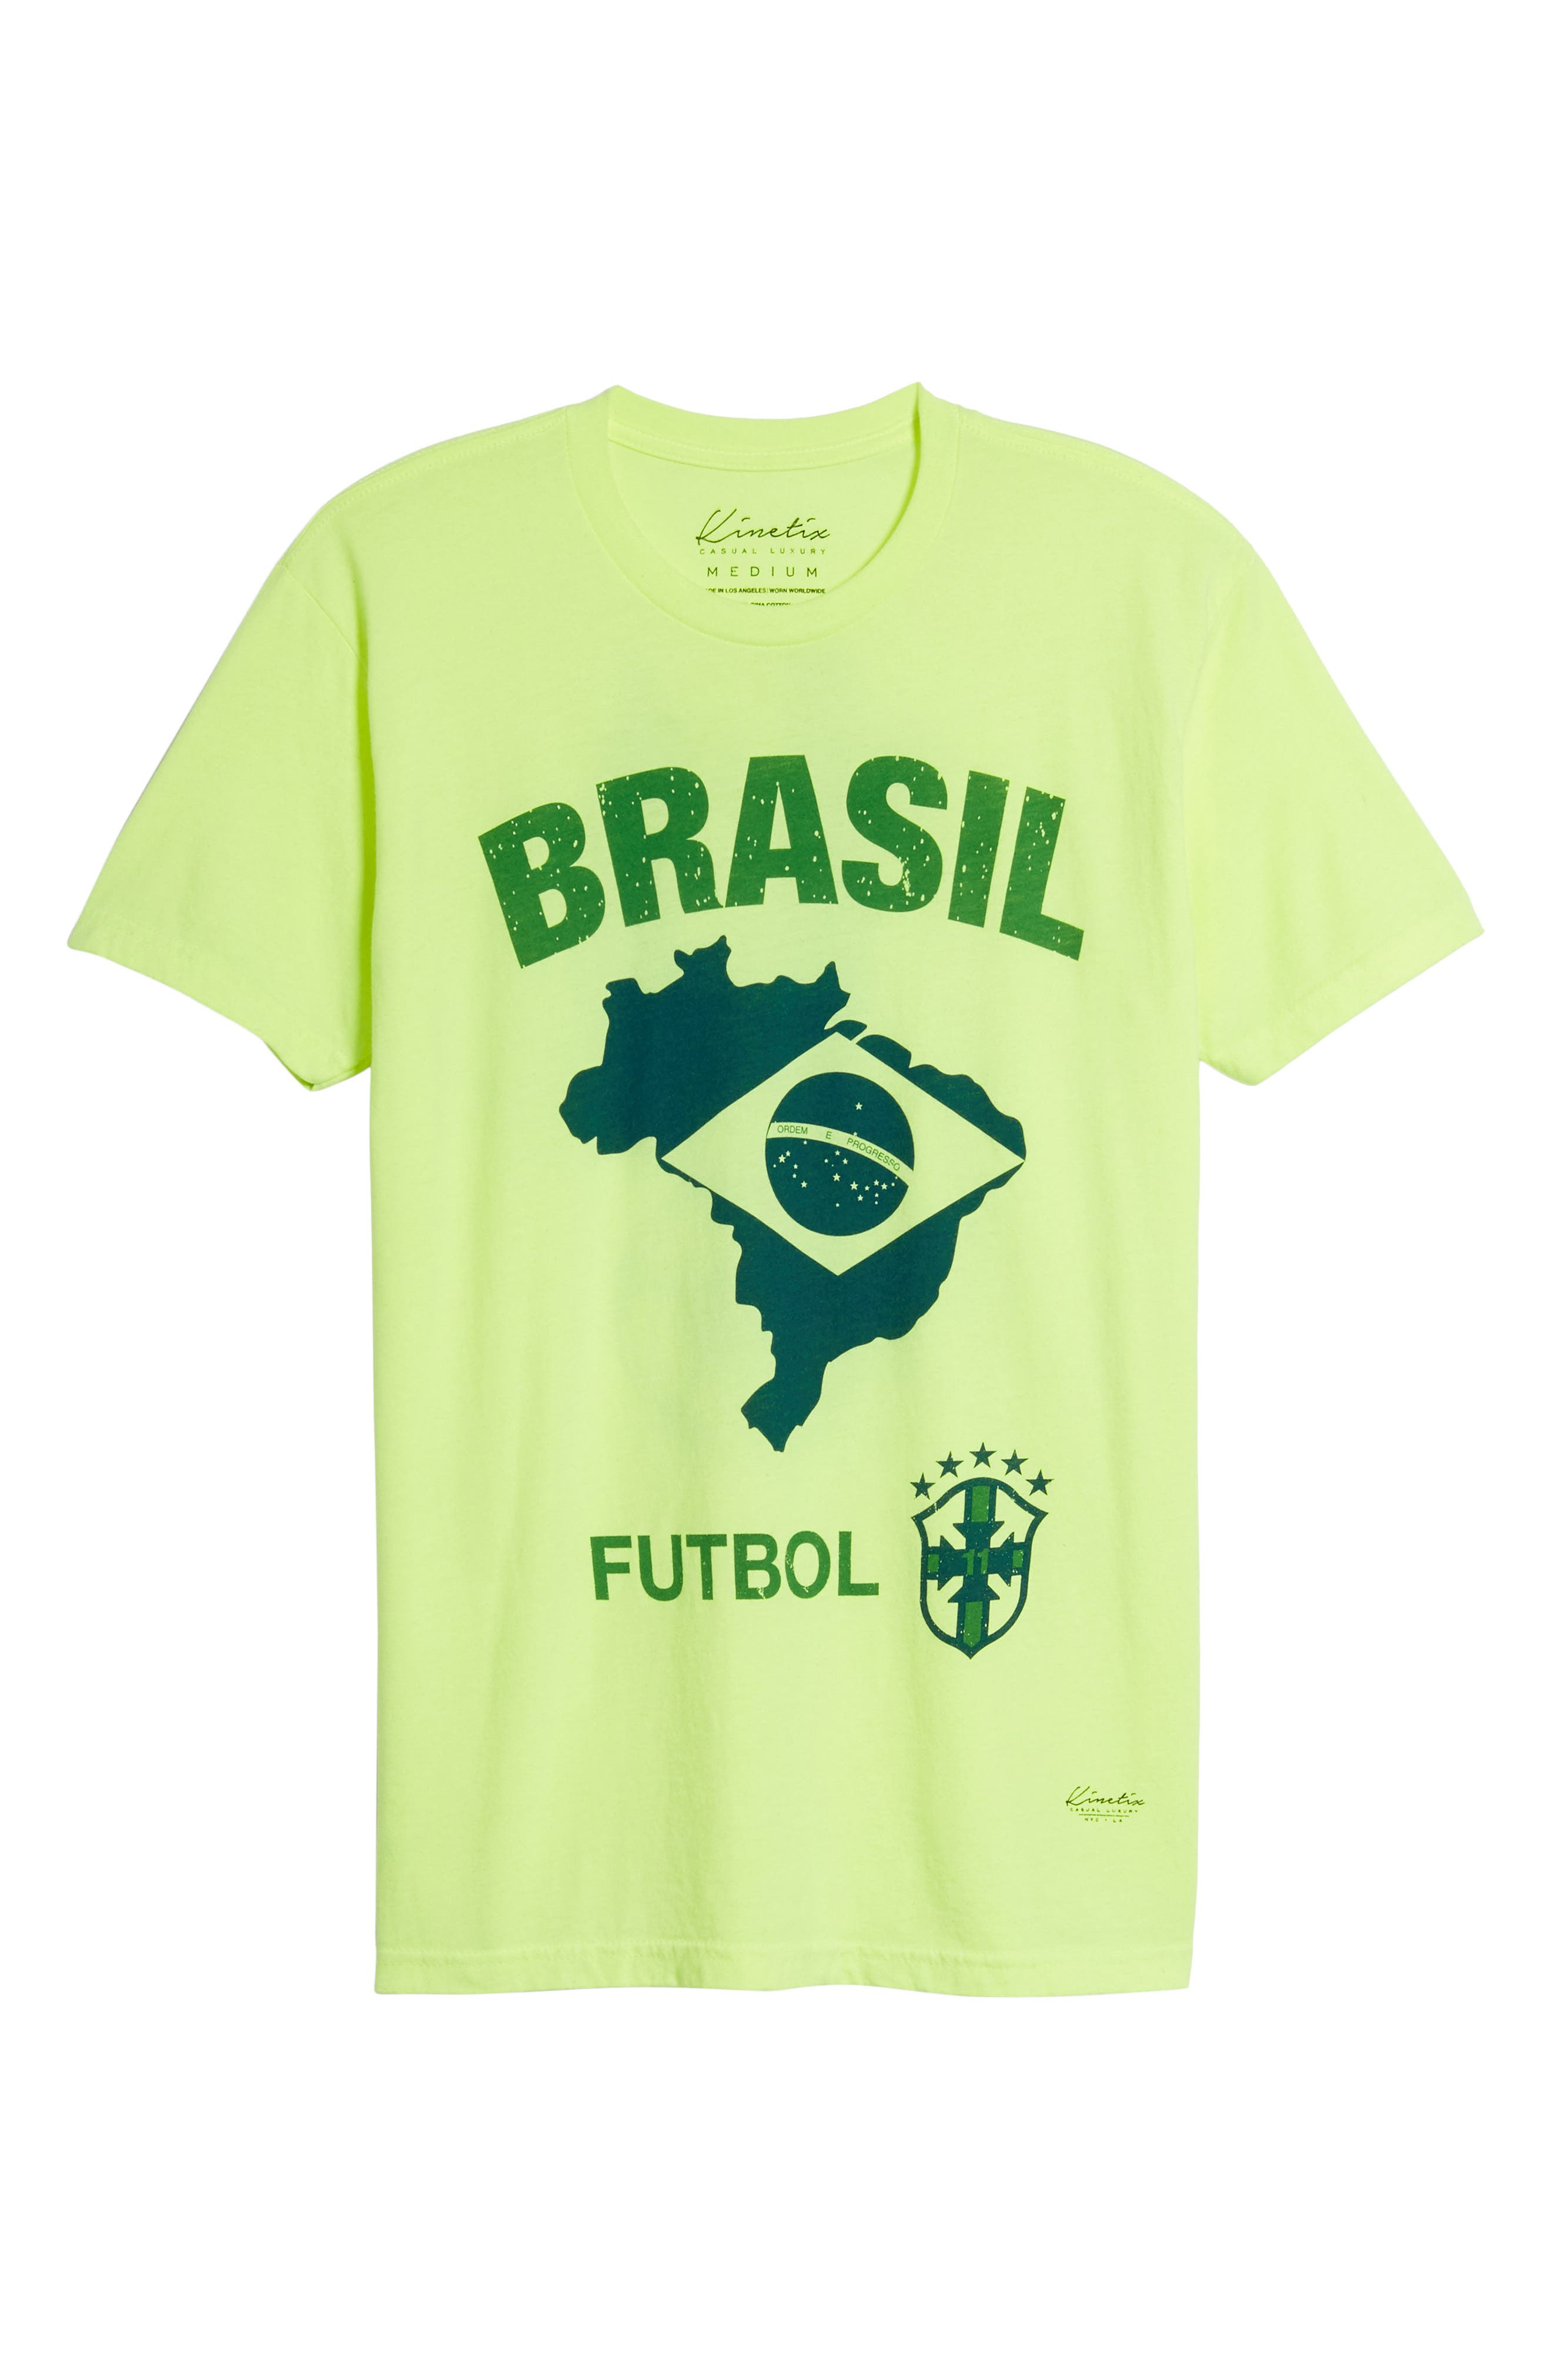 Brasil Futbol T-Shirt,                             Alternate thumbnail 6, color,                             700